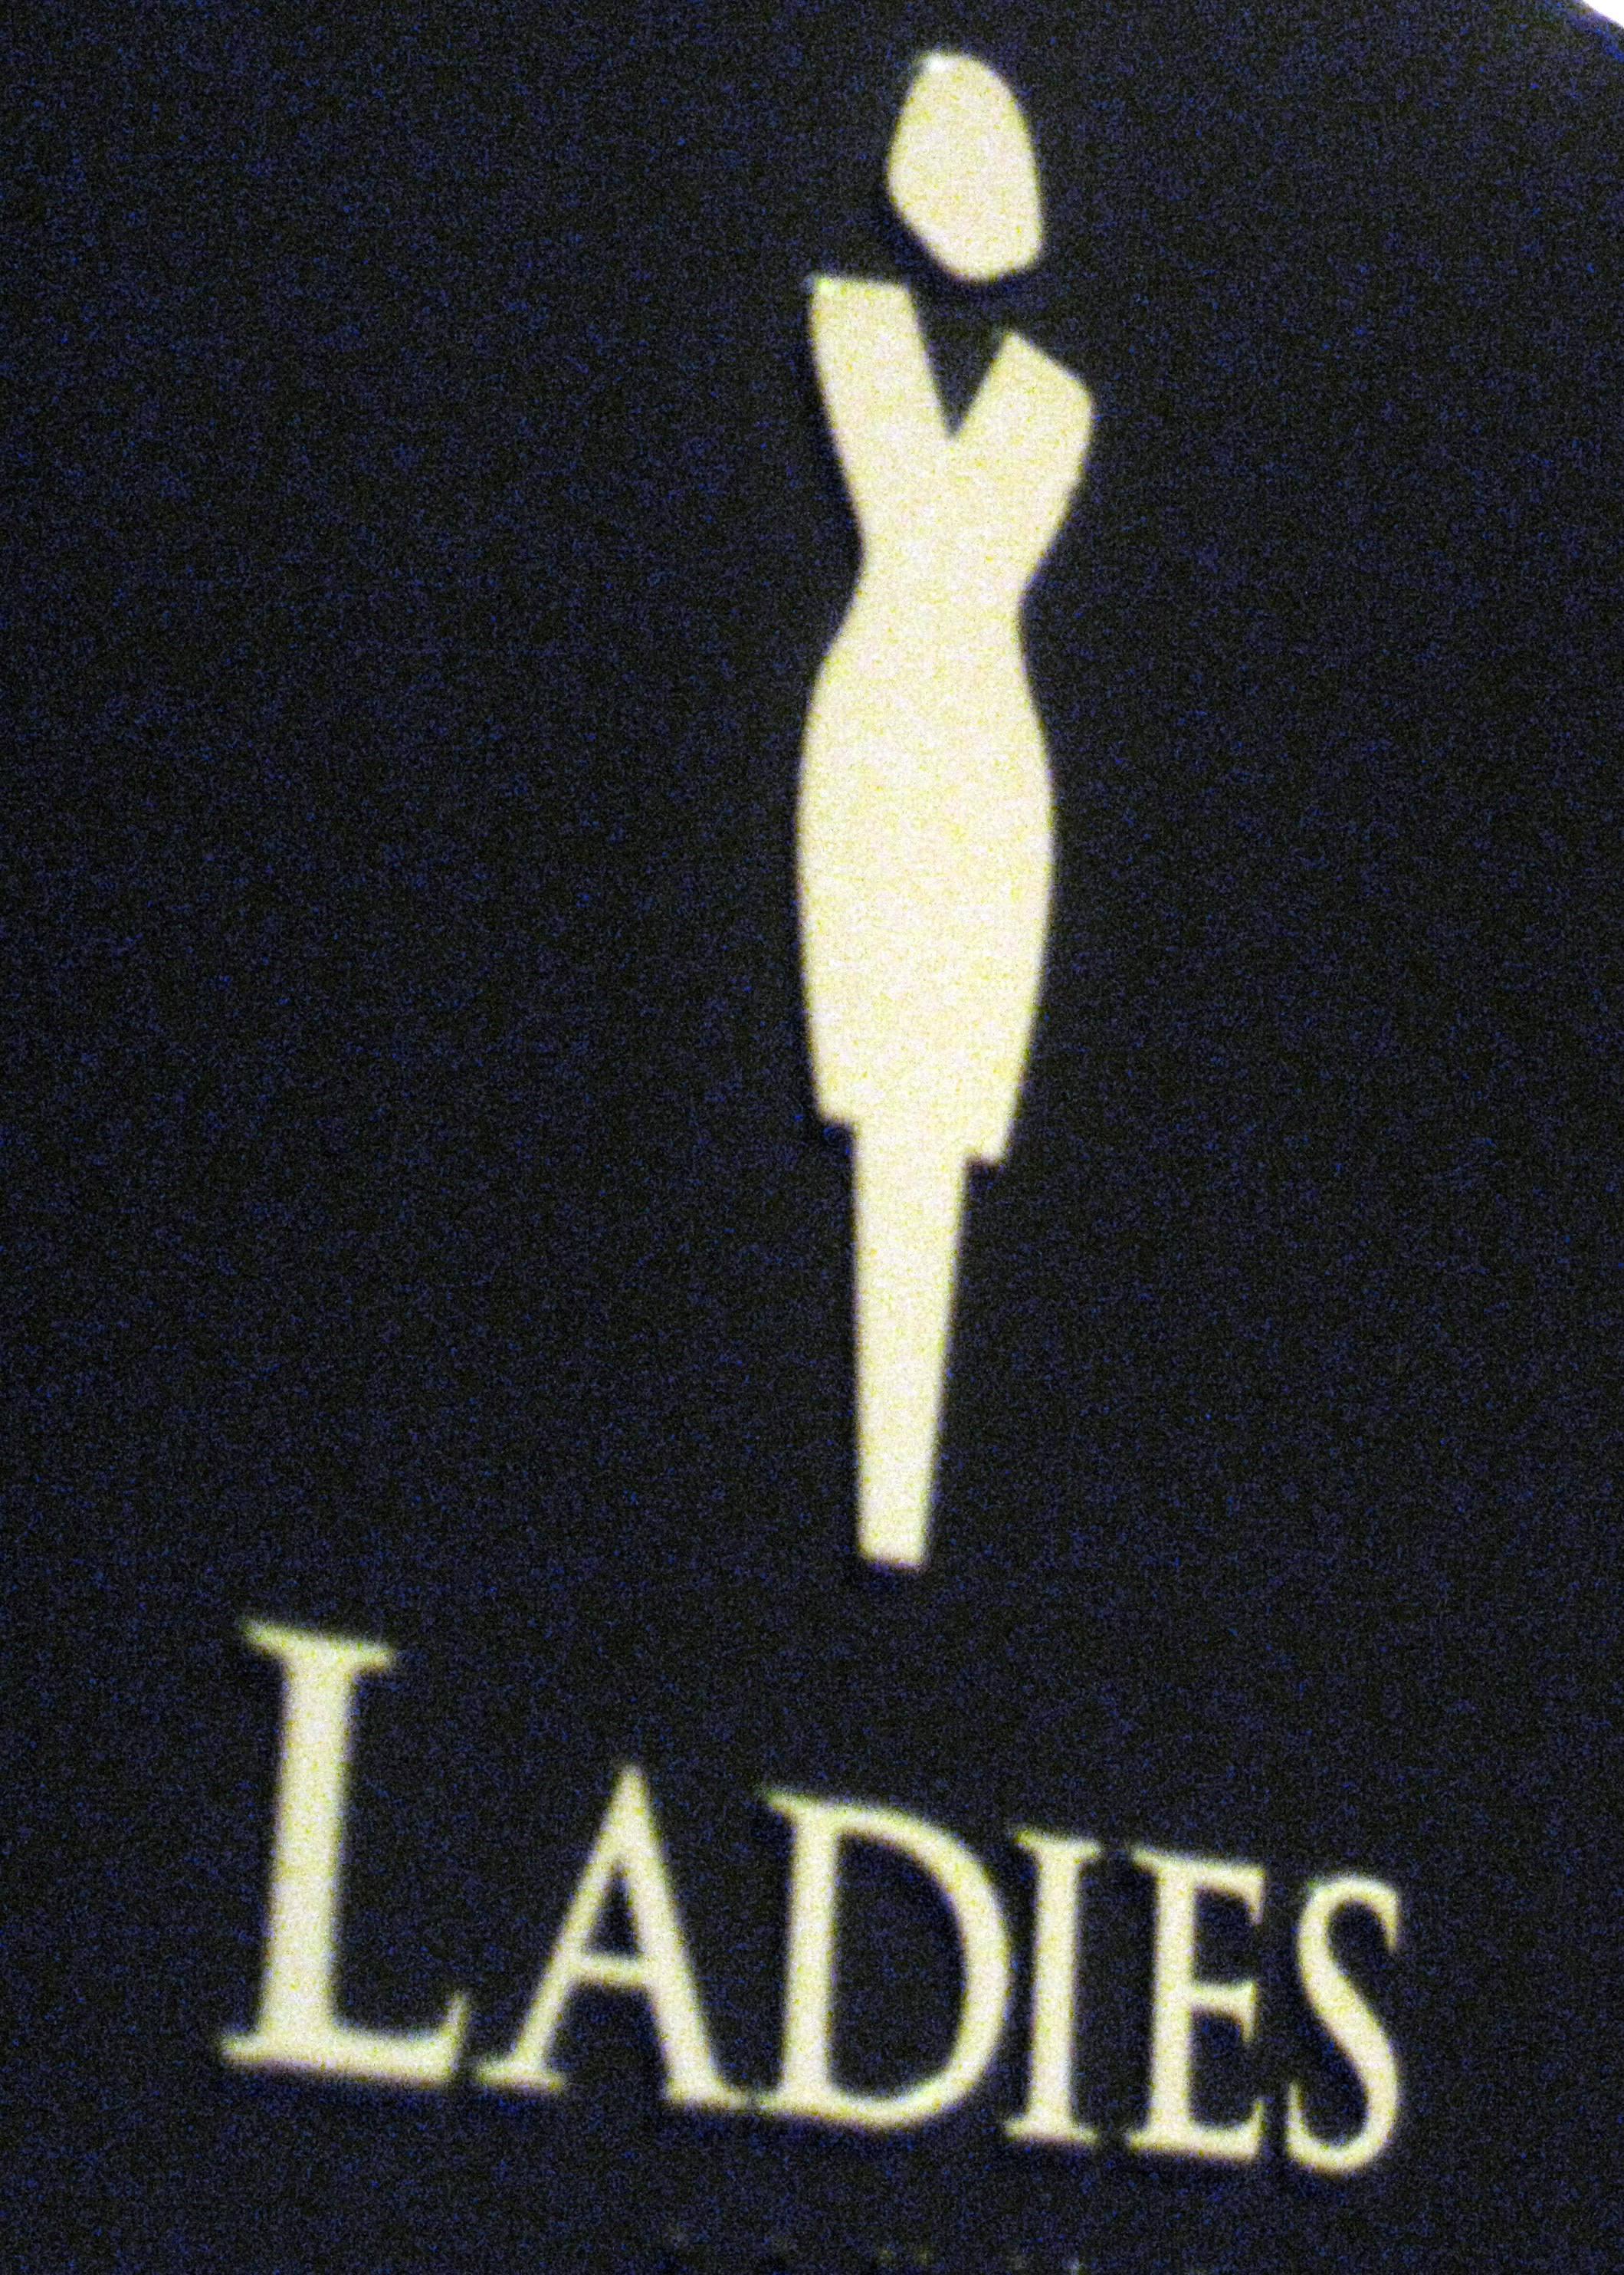 Ladies - The Wynn Las Vegas, Stocksdale